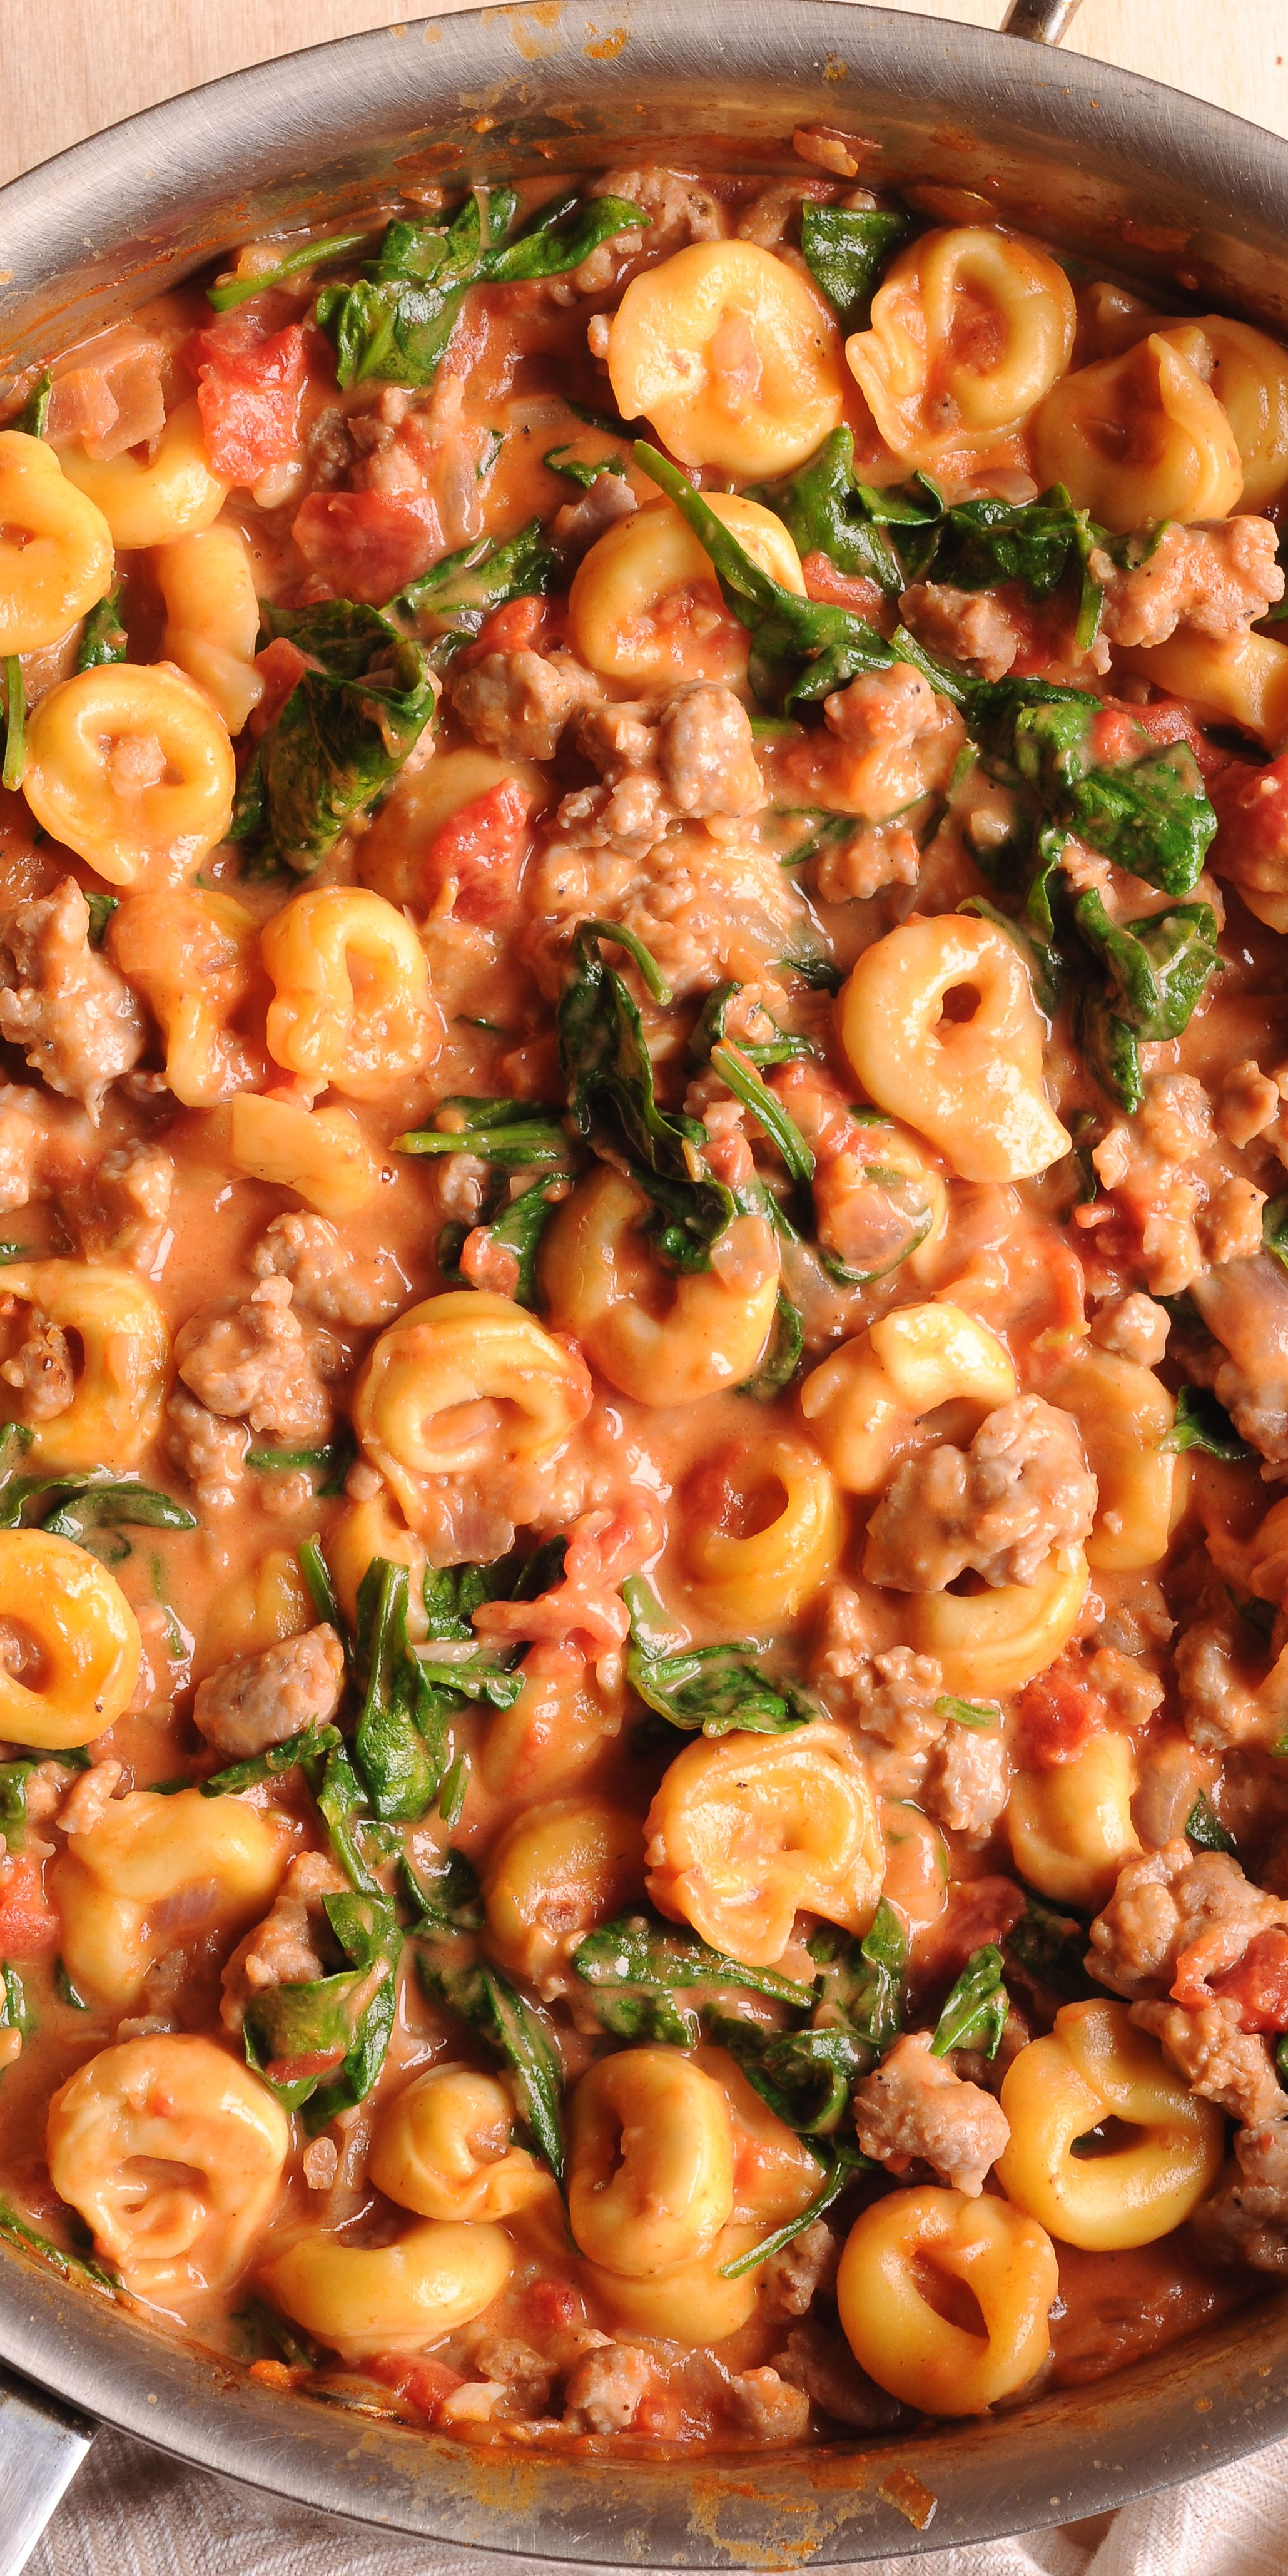 Creamy Tortellini With Sausage Tortellini Recipes Recipes Pasta Dishes